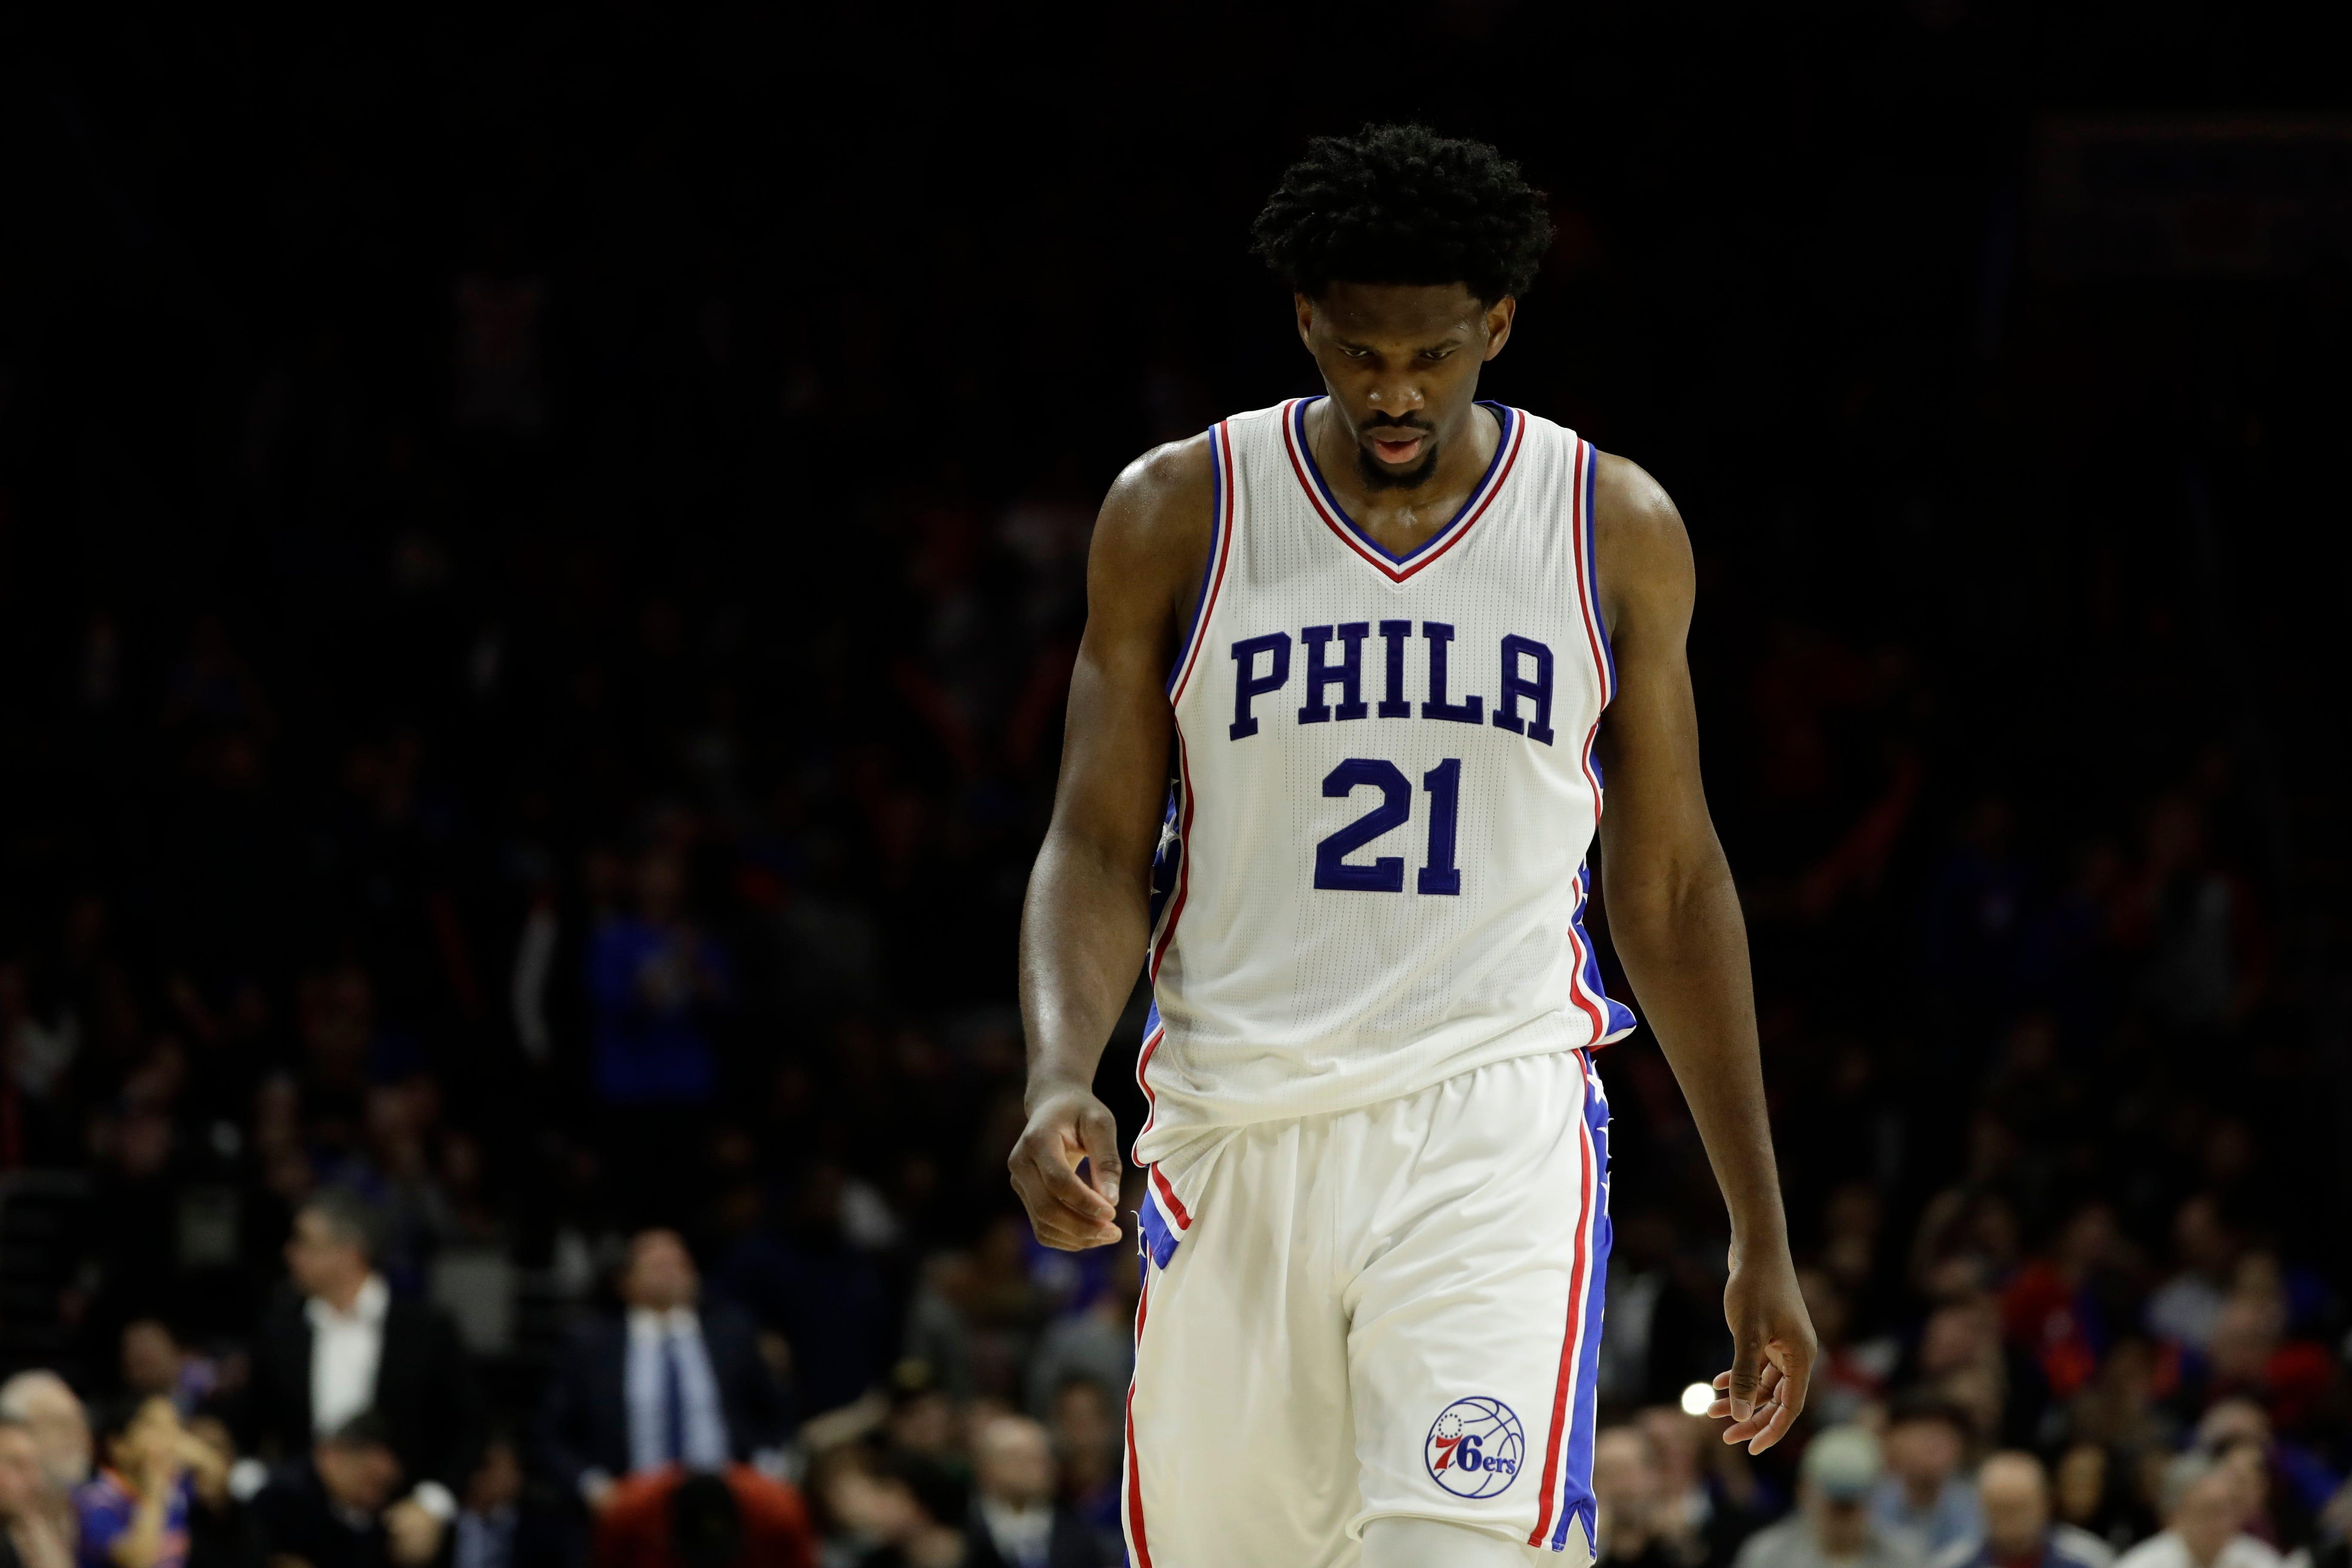 Philadelphia 76ers star Joel Embiid still not cleared for 5-on-5 drills